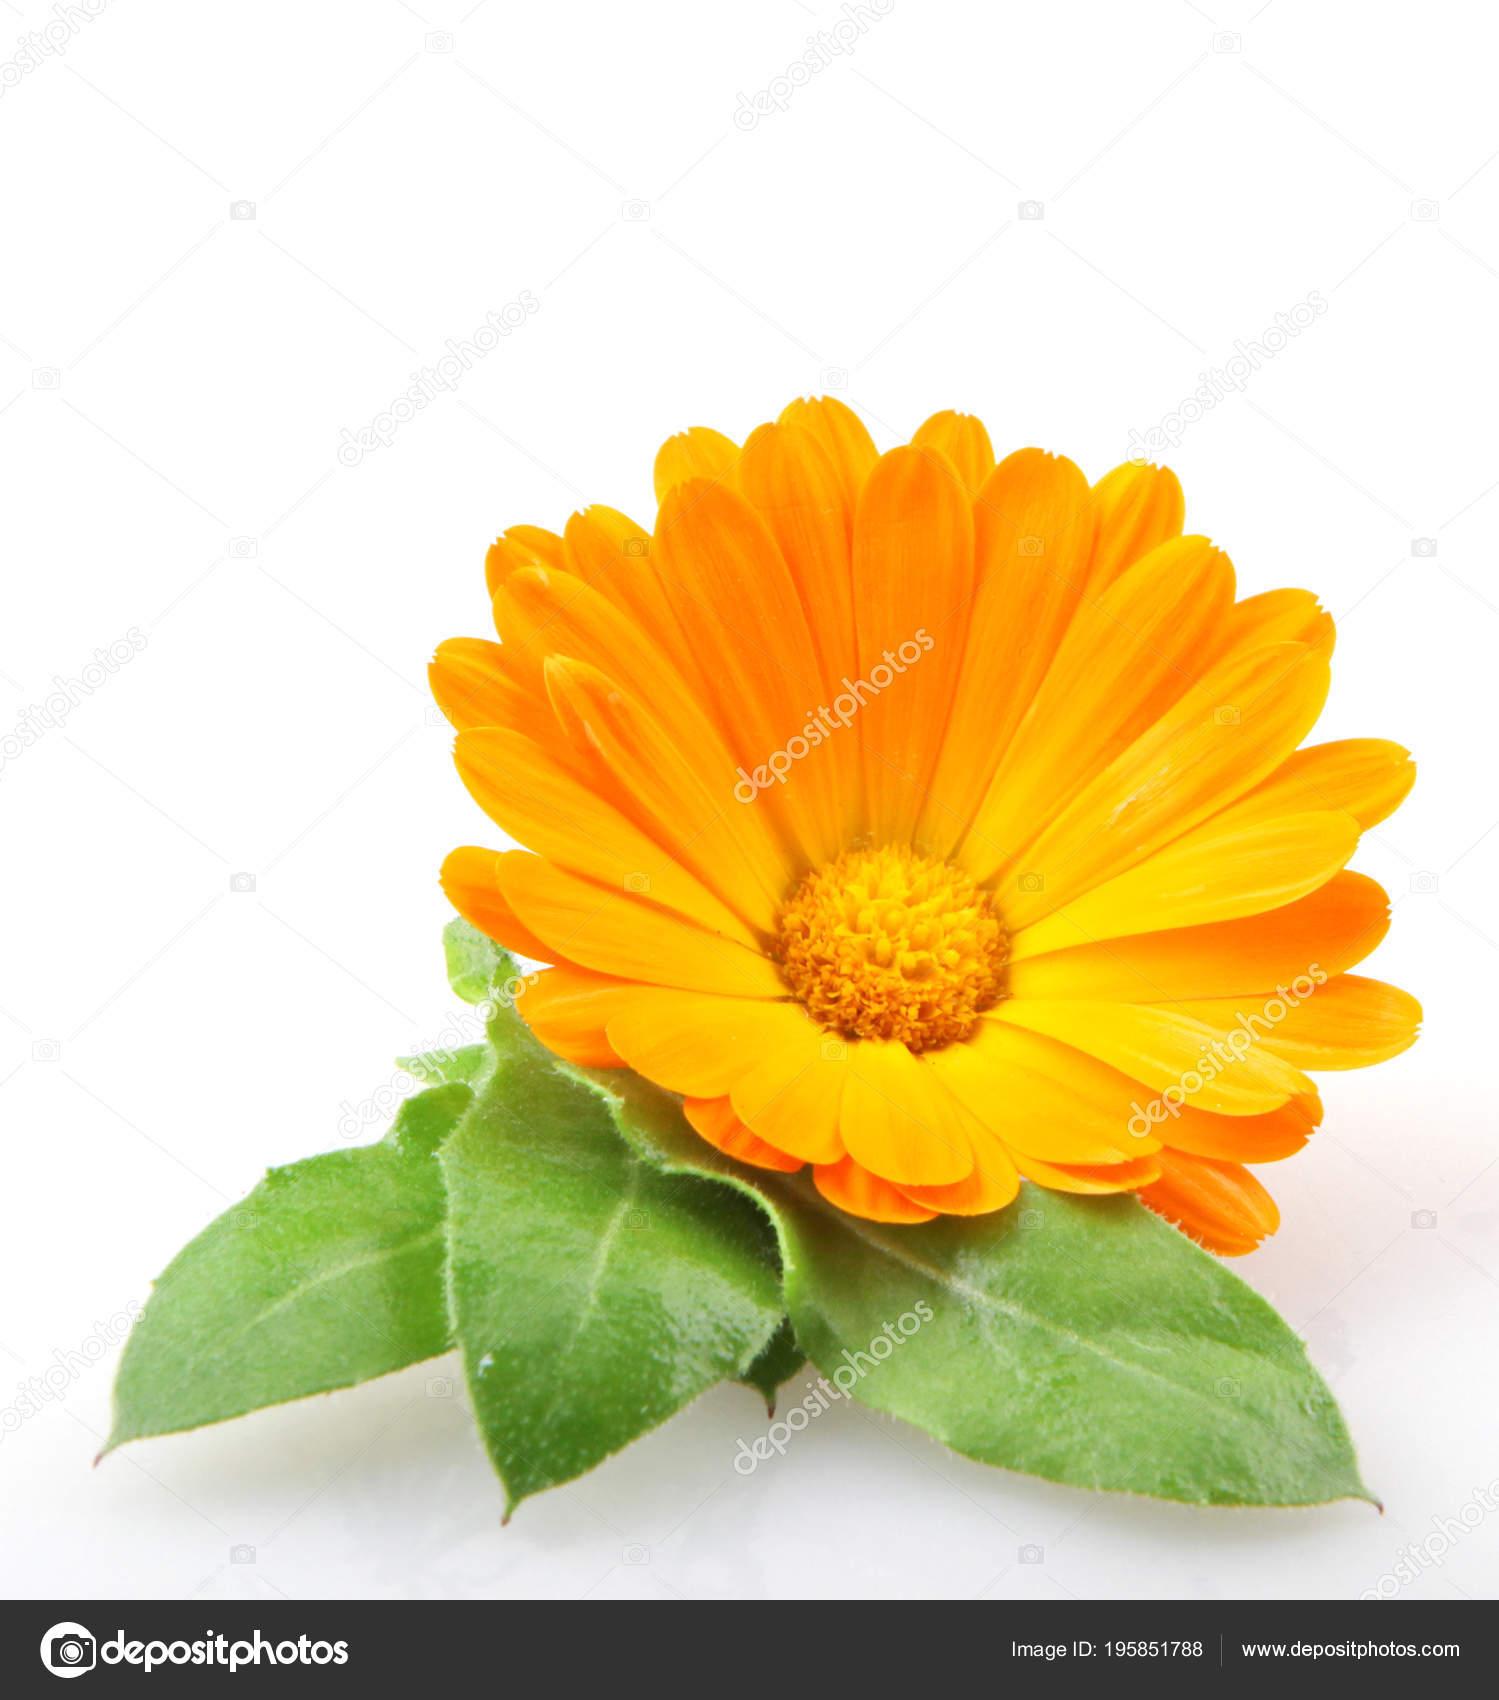 afbeelding-goudsbloem-calendula-officinalis..jpg